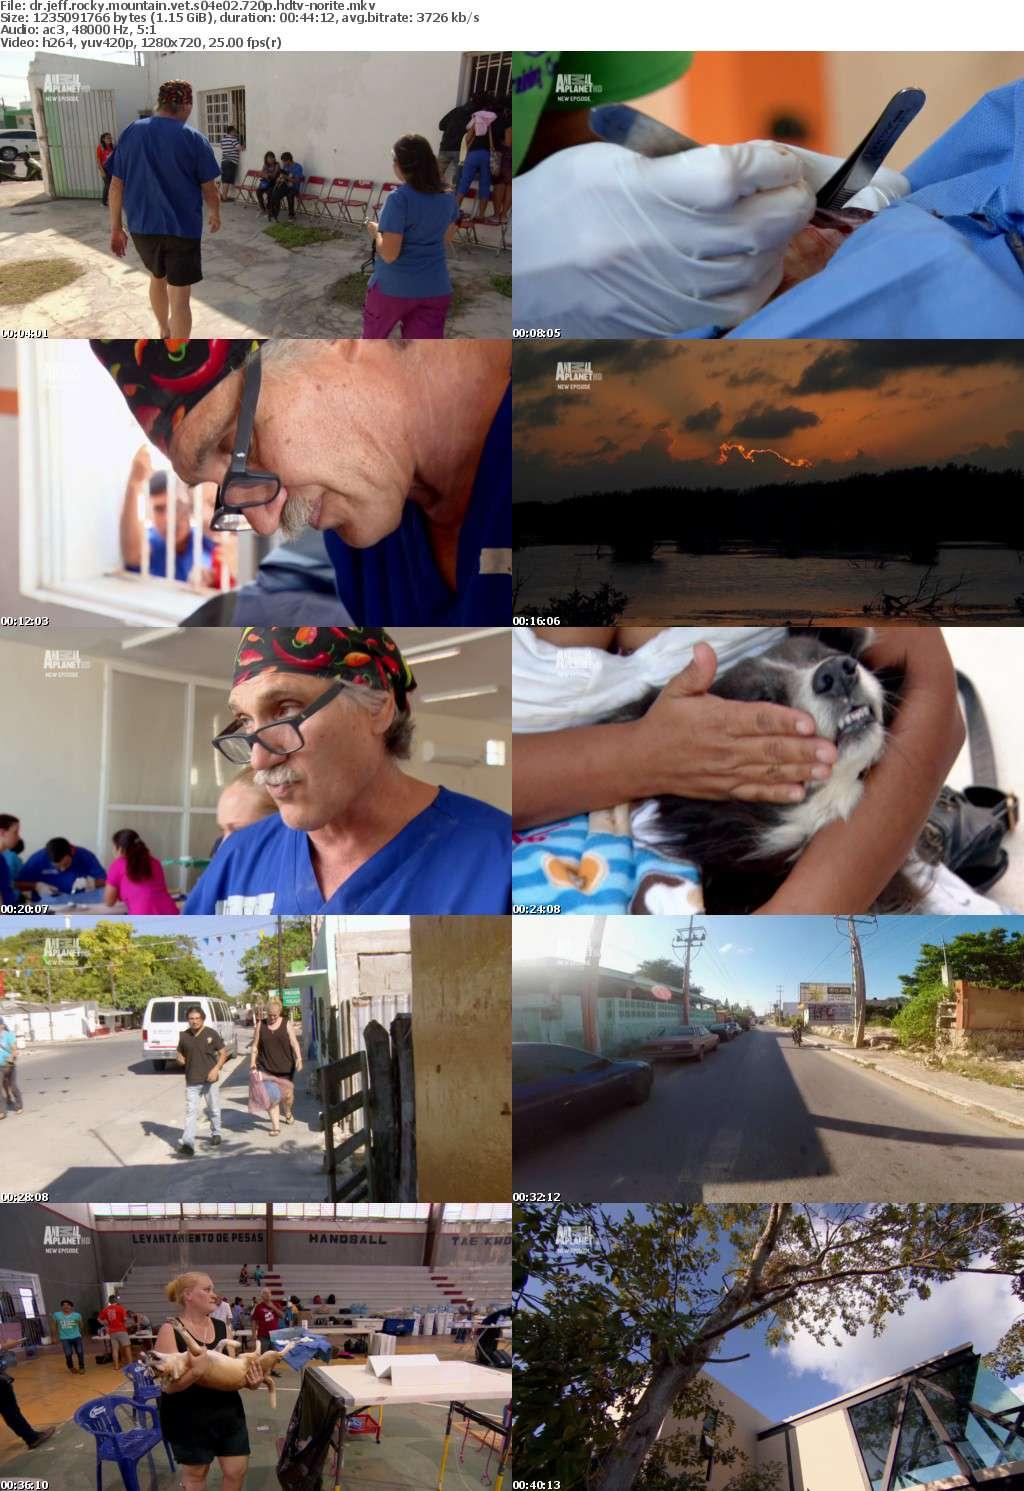 Dr Jeff Rocky Mountain Vet S04E02 720p HDTV x264-NORiTE